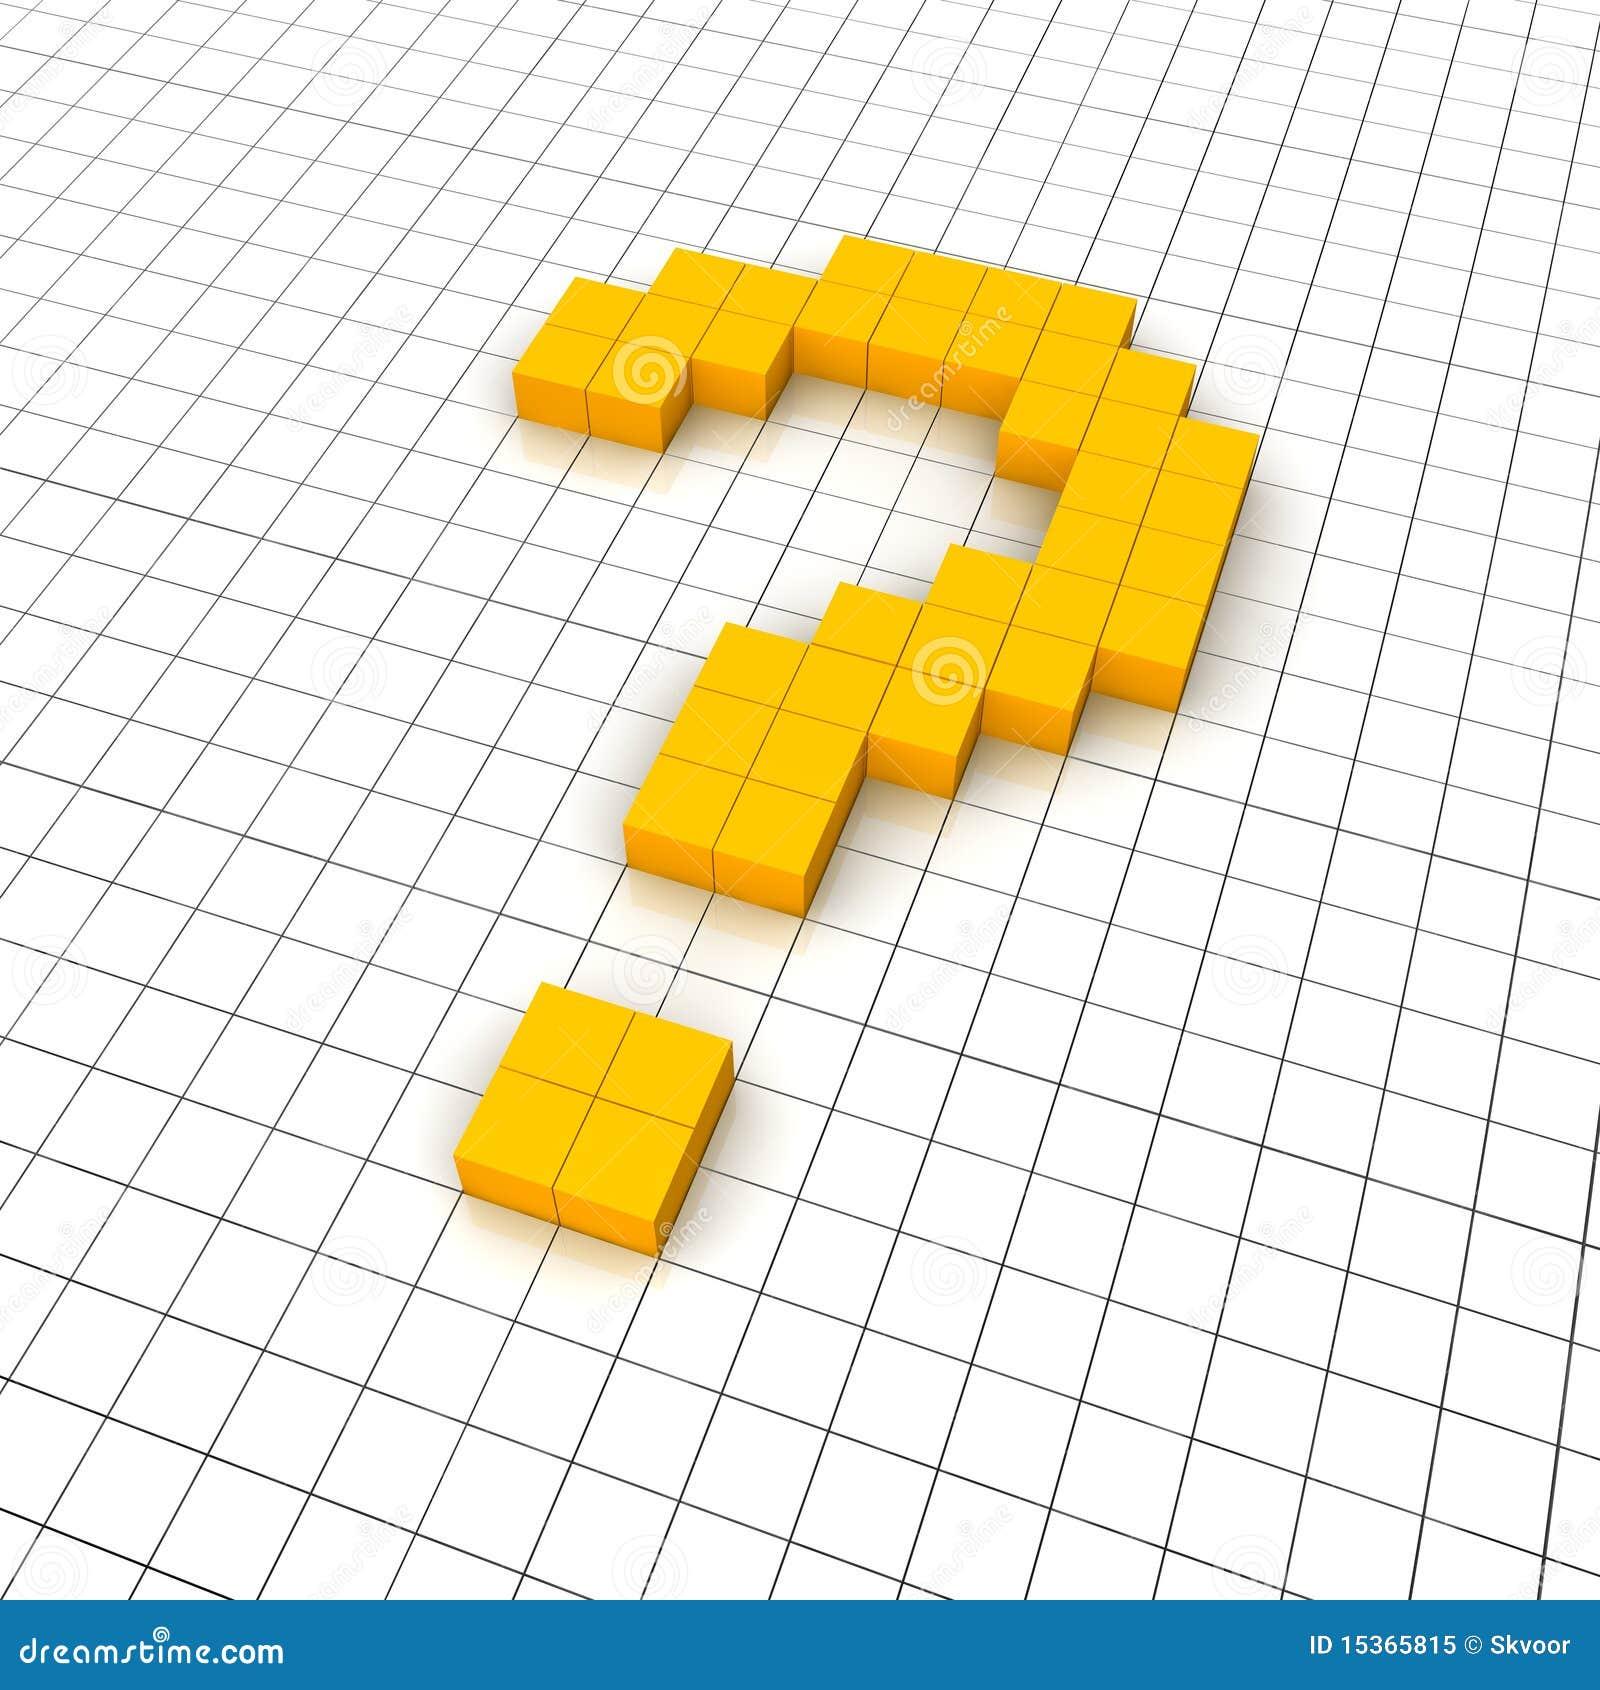 3d Question Mark Icon Stock Illustration. Illustration Of